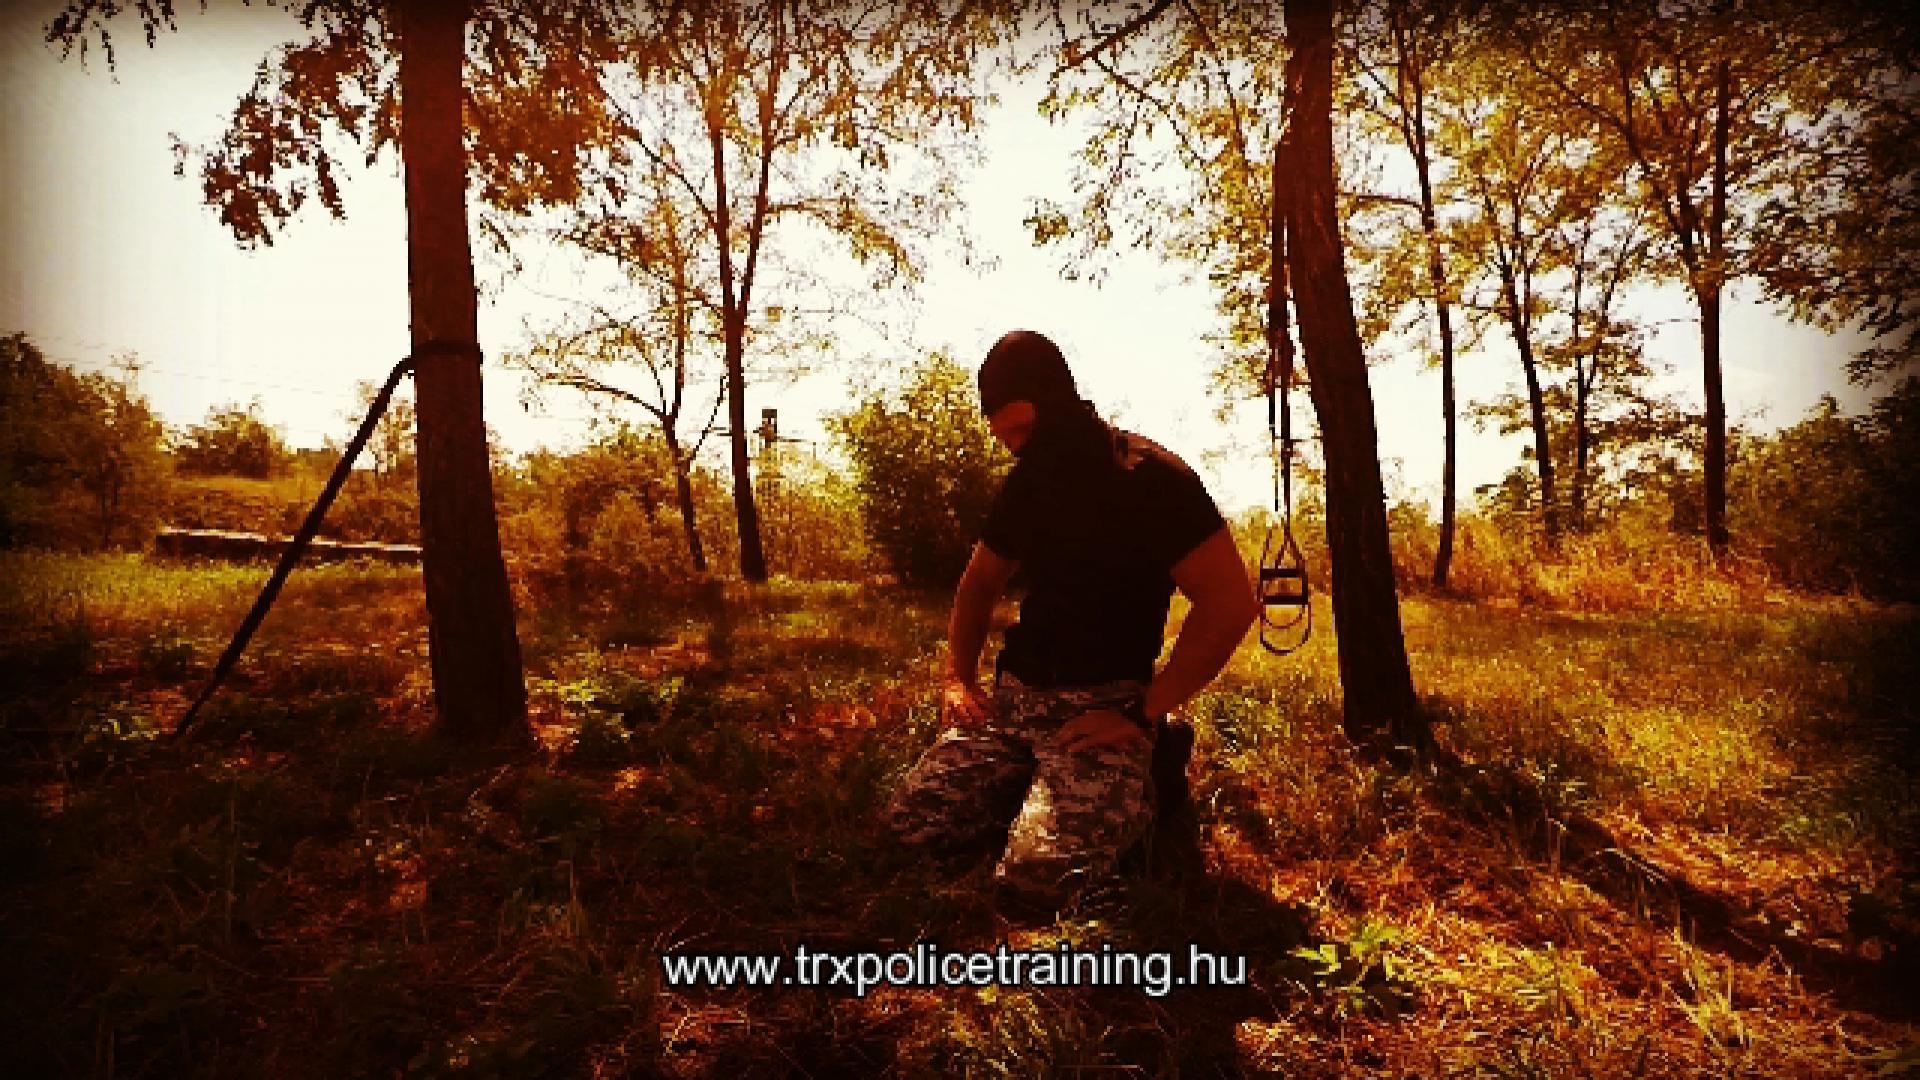 TRX POLICE TRAINING - UPPER BODY